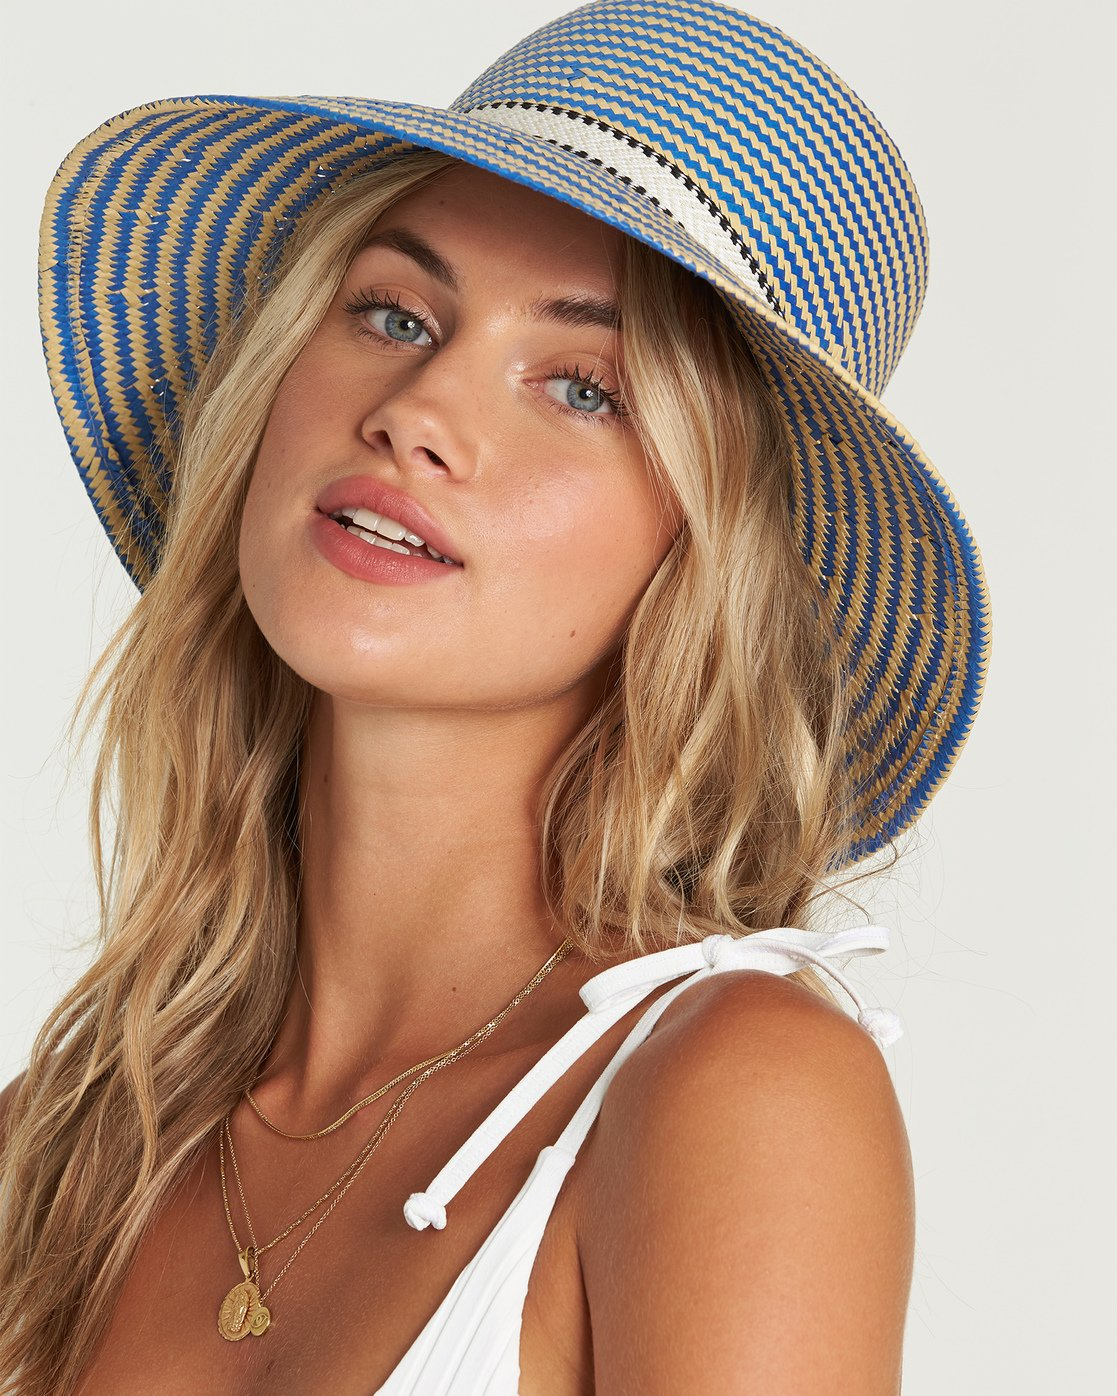 Billabong Now Or Never Hat - Summer Hat Guide